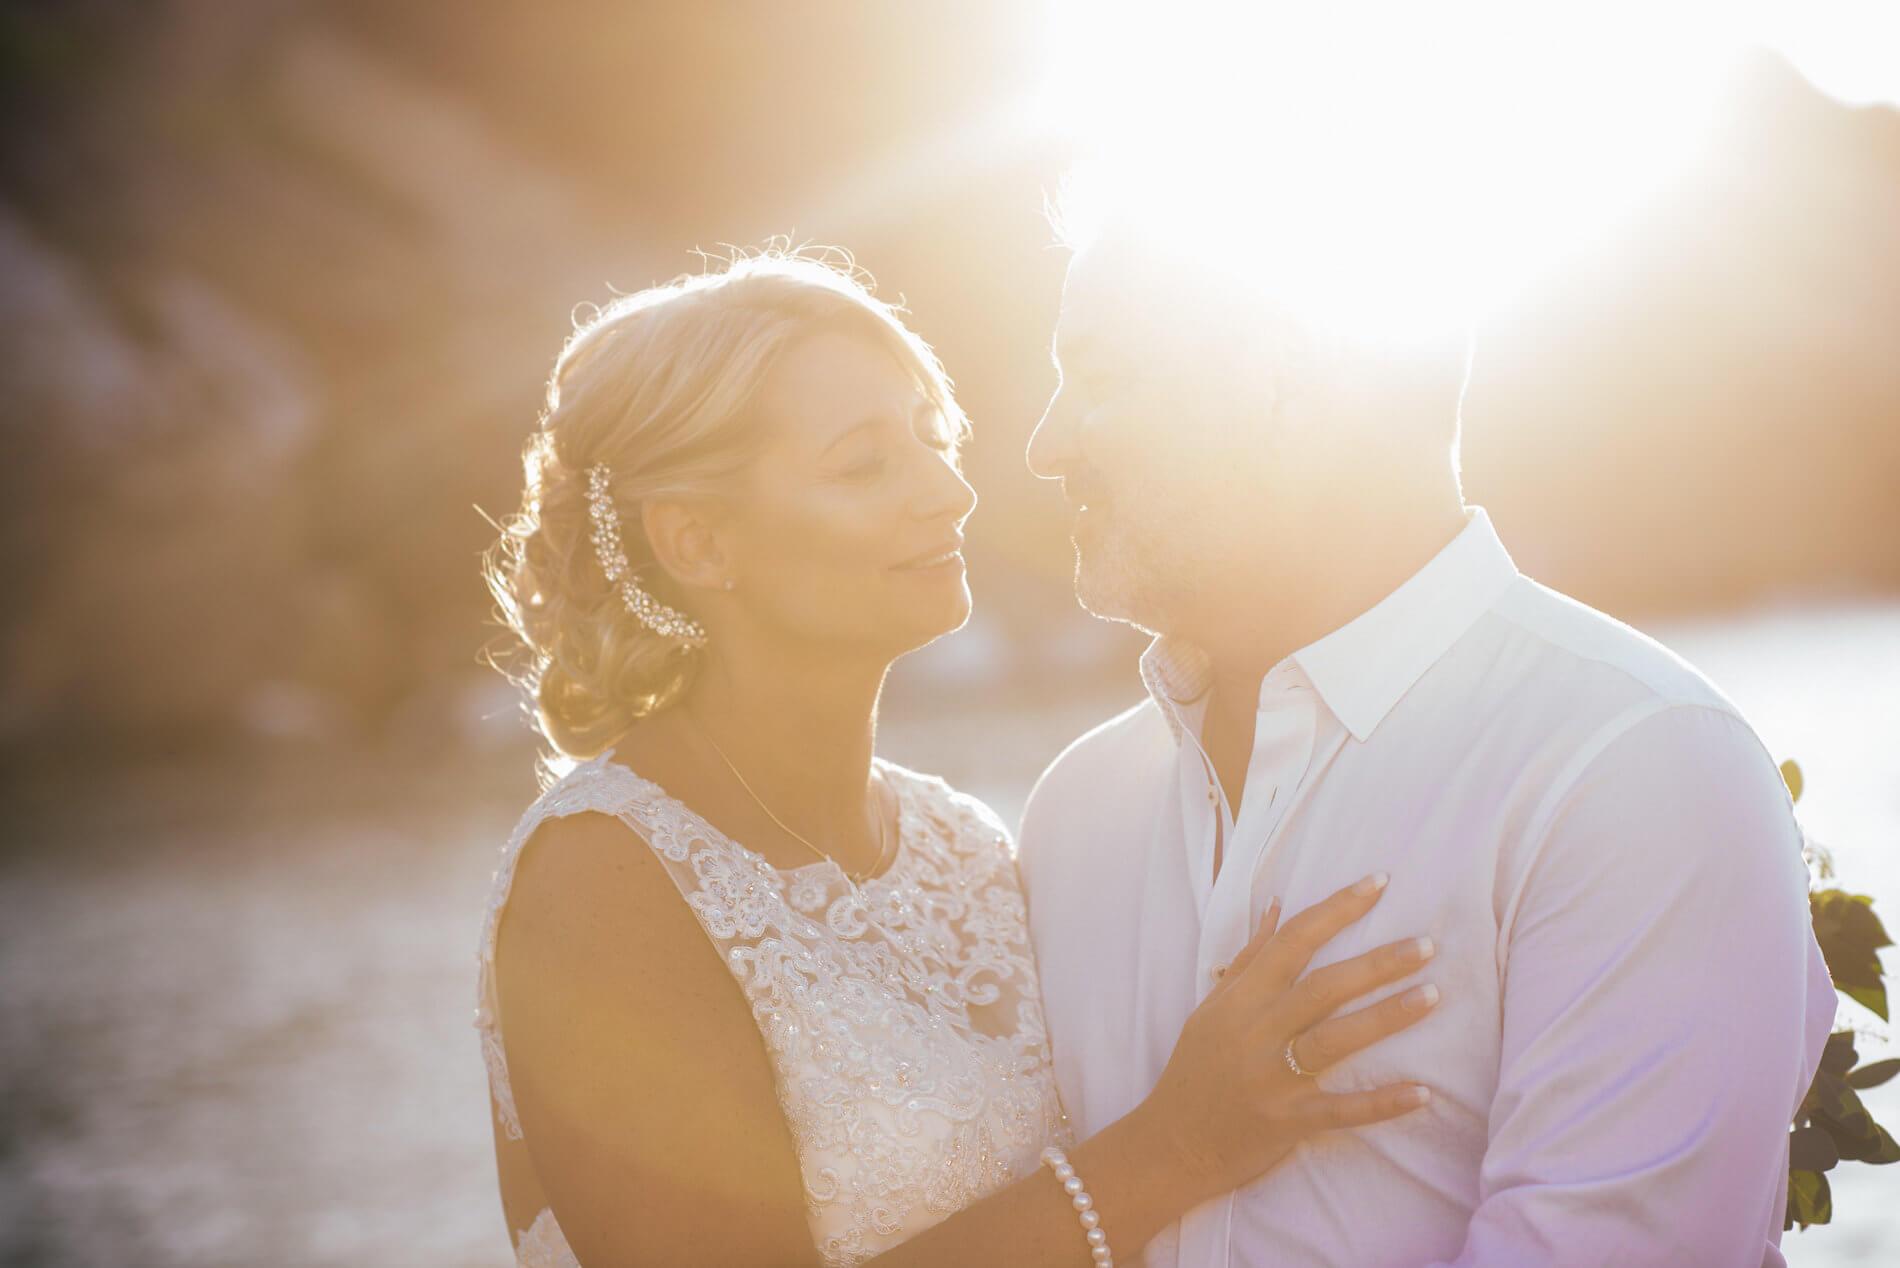 https://www.white-ibiza.com/wp-content/uploads/2020/03/ibiza-wedding-venue-maya-beach-club-2020-02.jpg